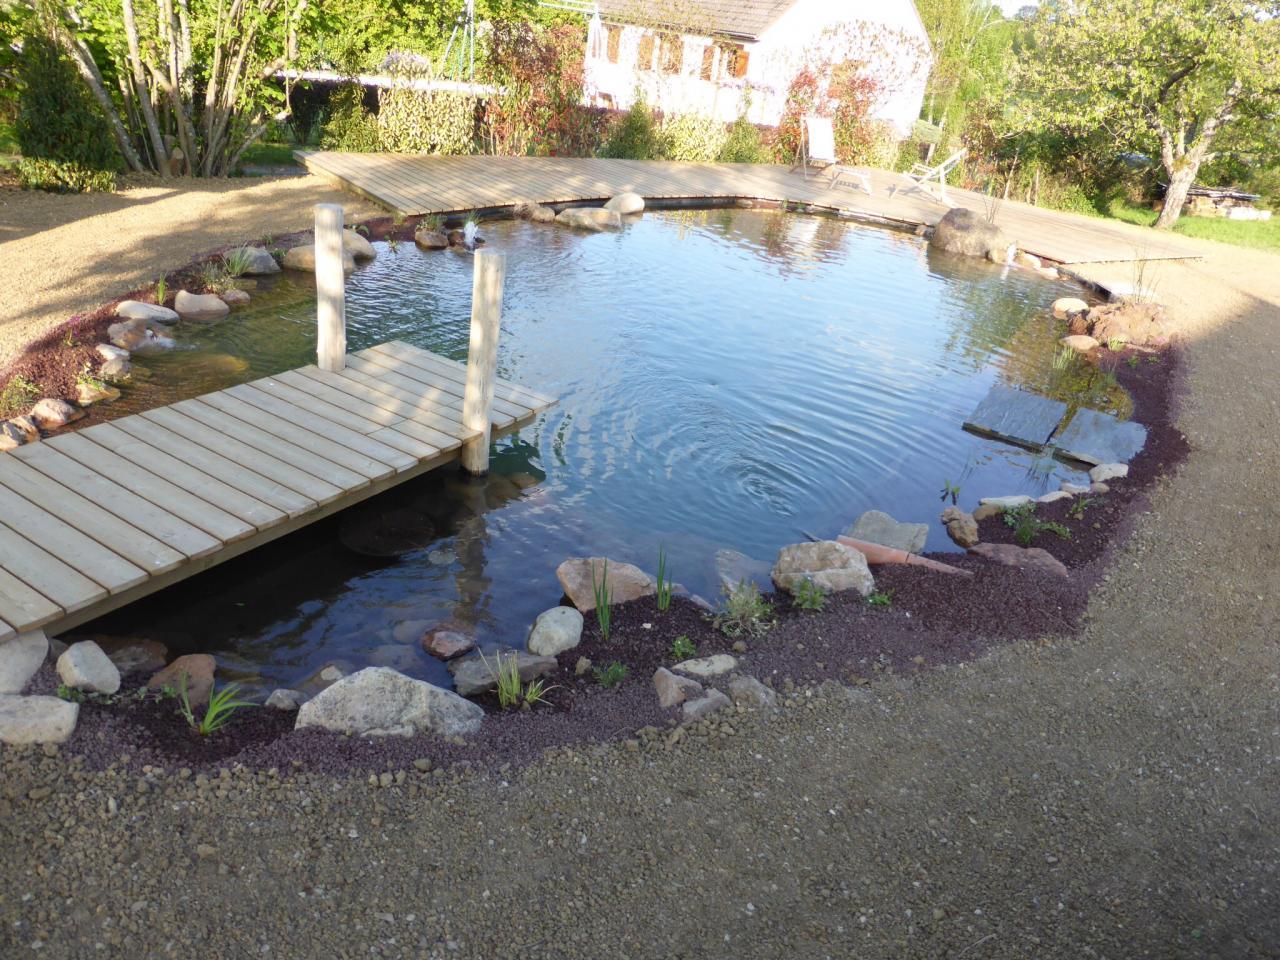 Bassin de baignade et terrasse bois